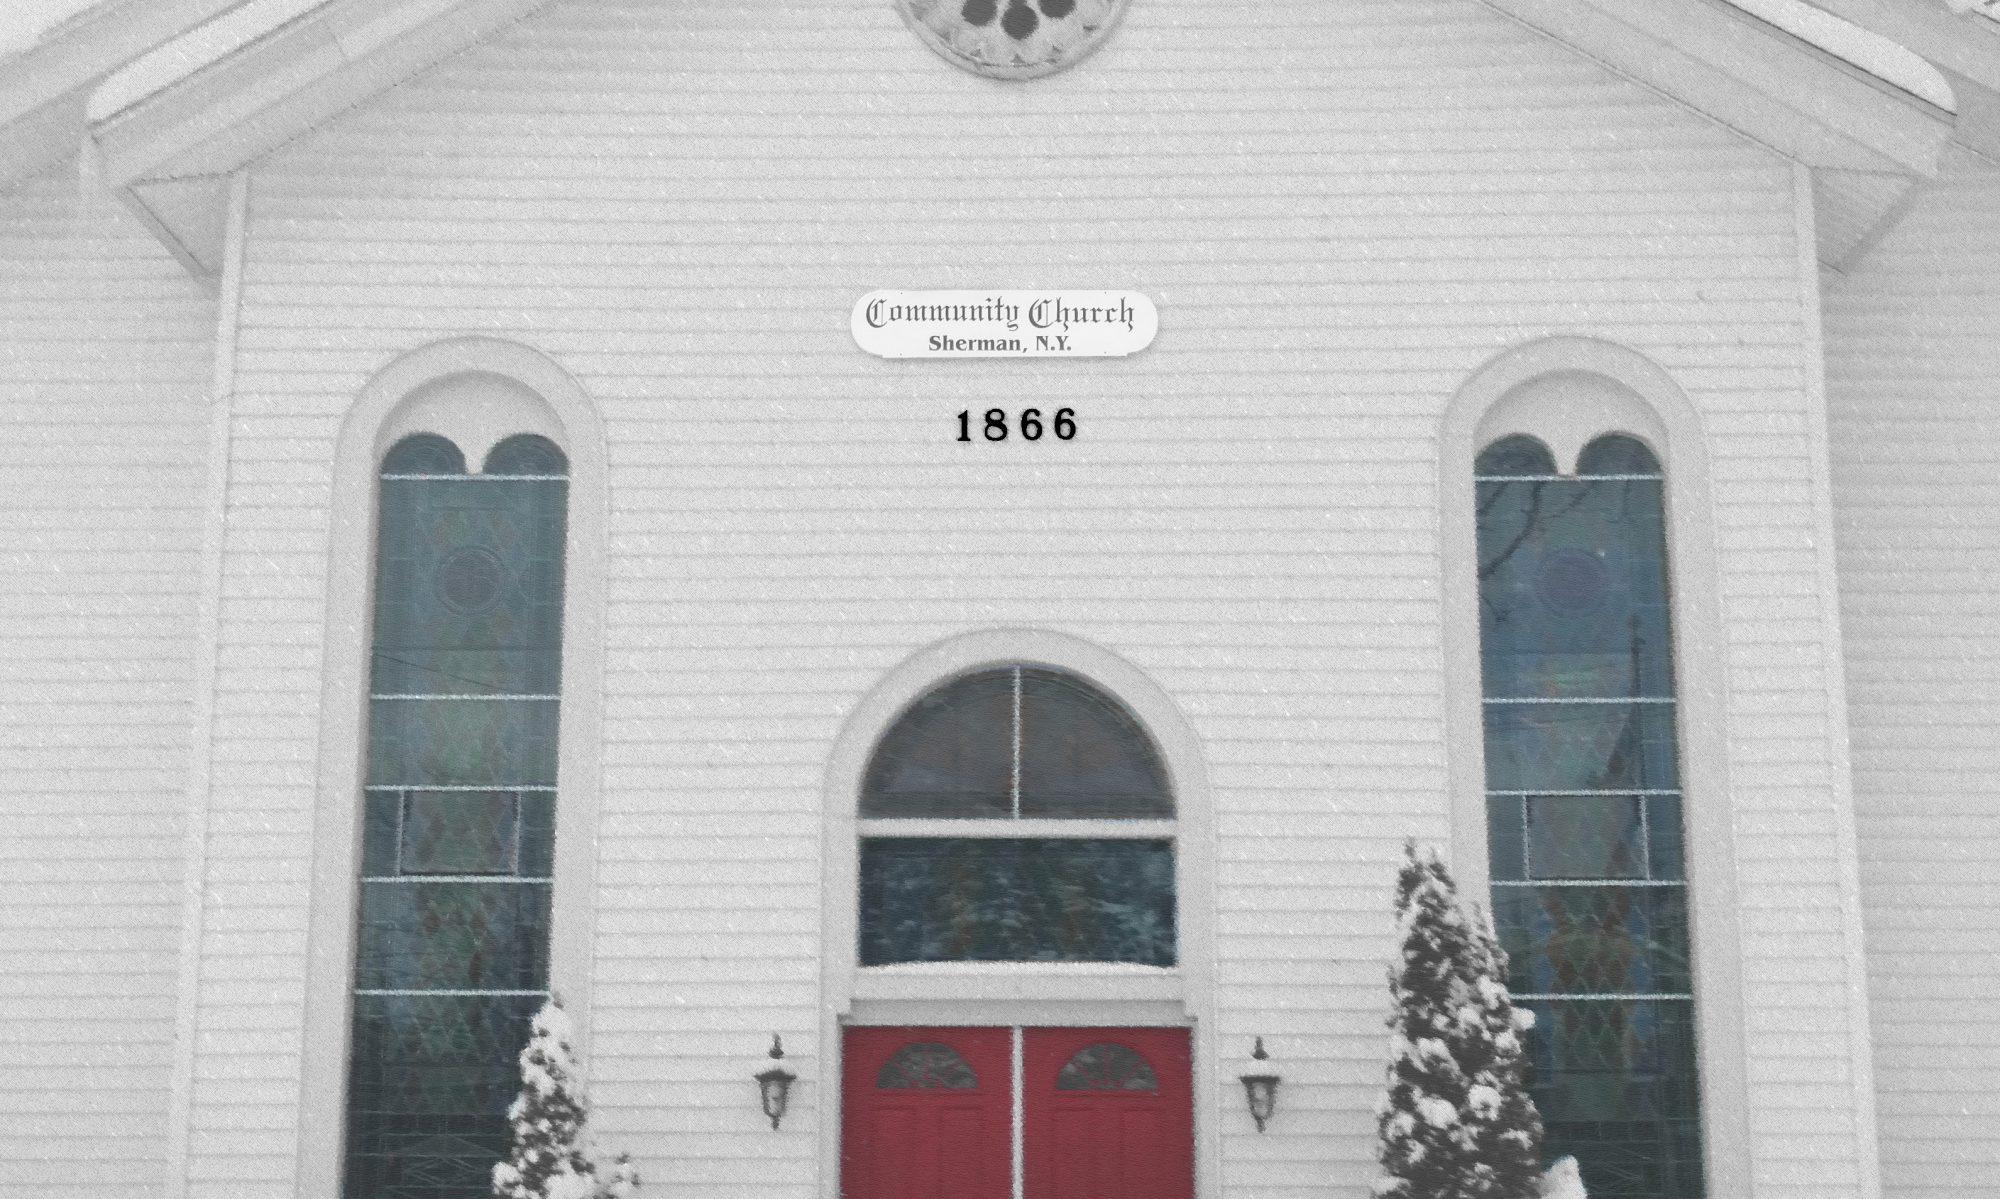 Sherman Community Church